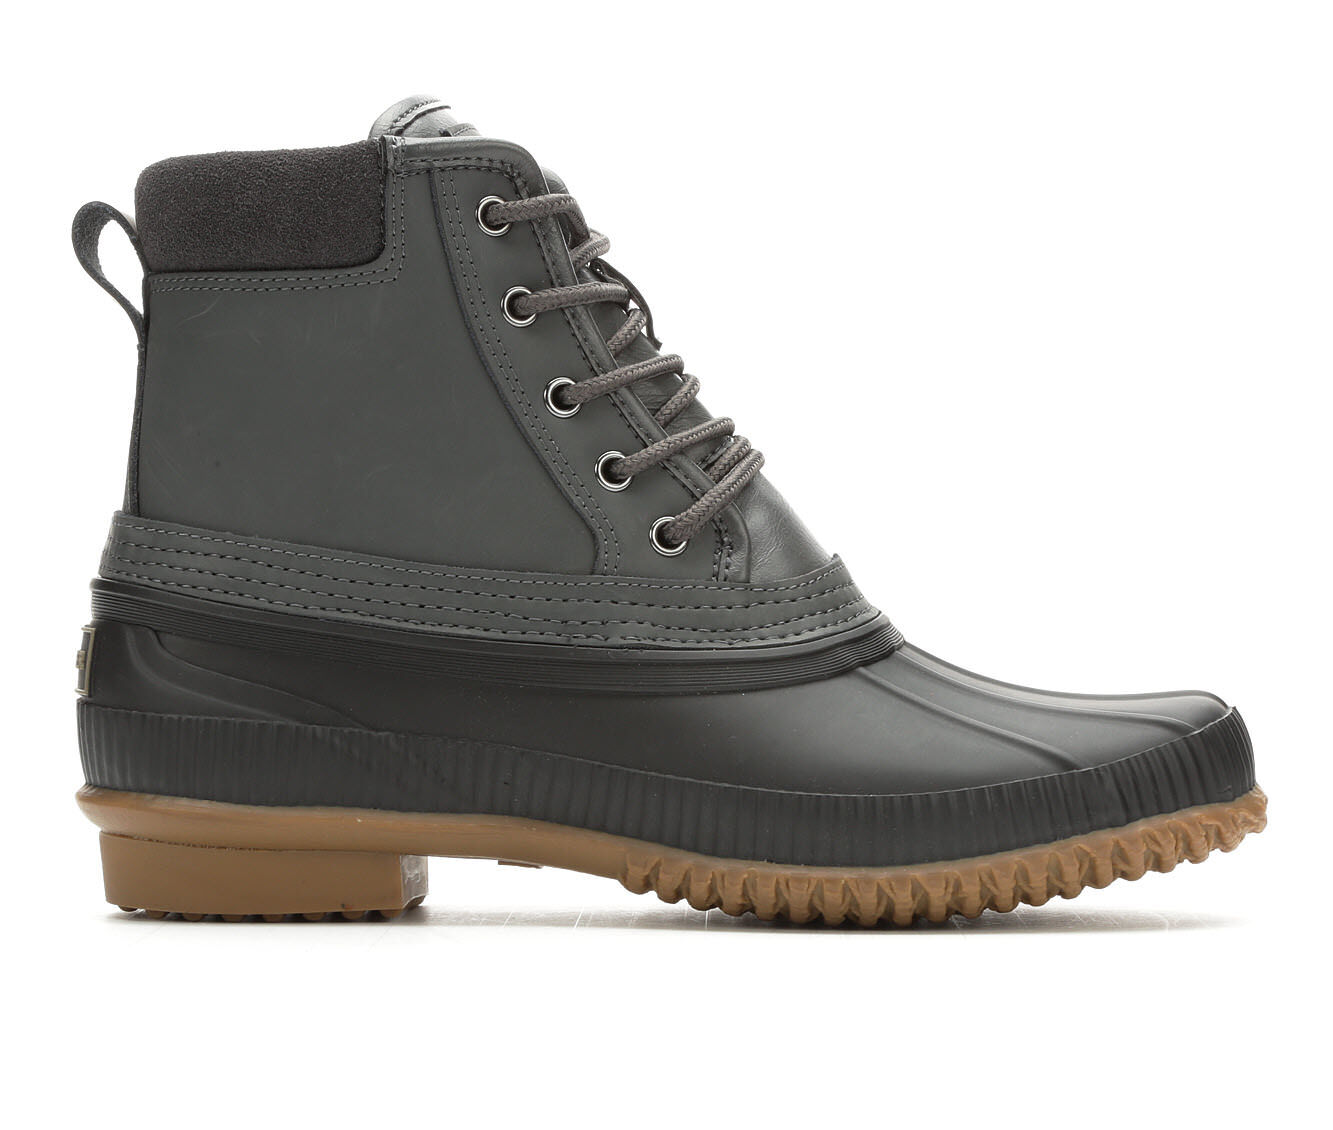 Men's Tommy Hilfiger TM-Casey Winter Boots Charcoal/Black